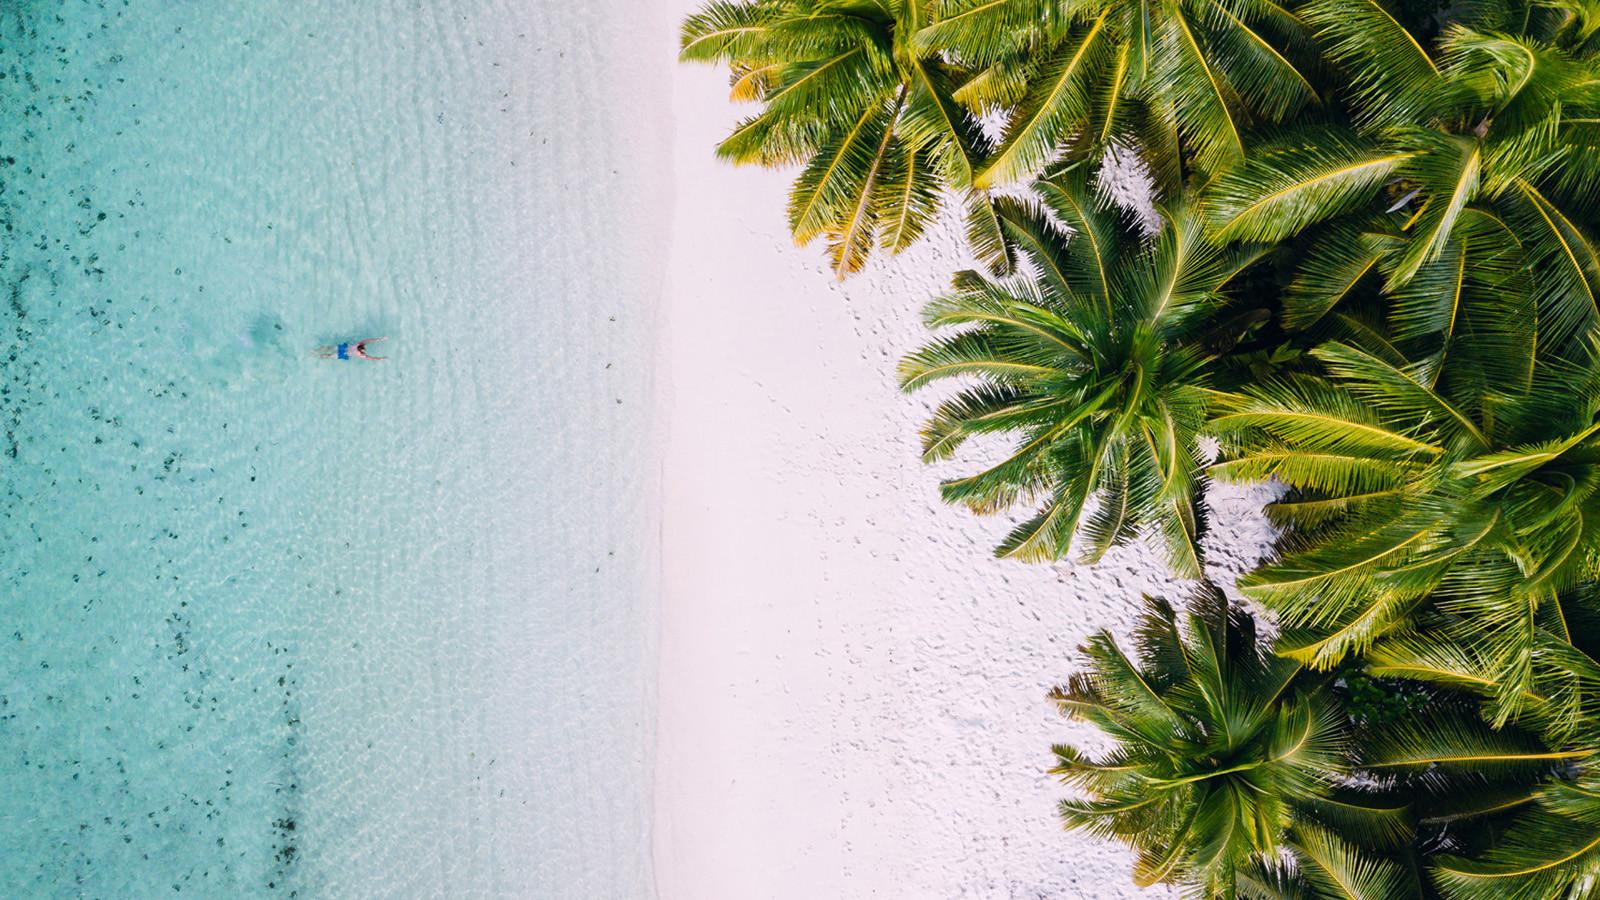 news-main-four-seasons-resorts-seychelles-bring-paradise-home.1588248263.jpg